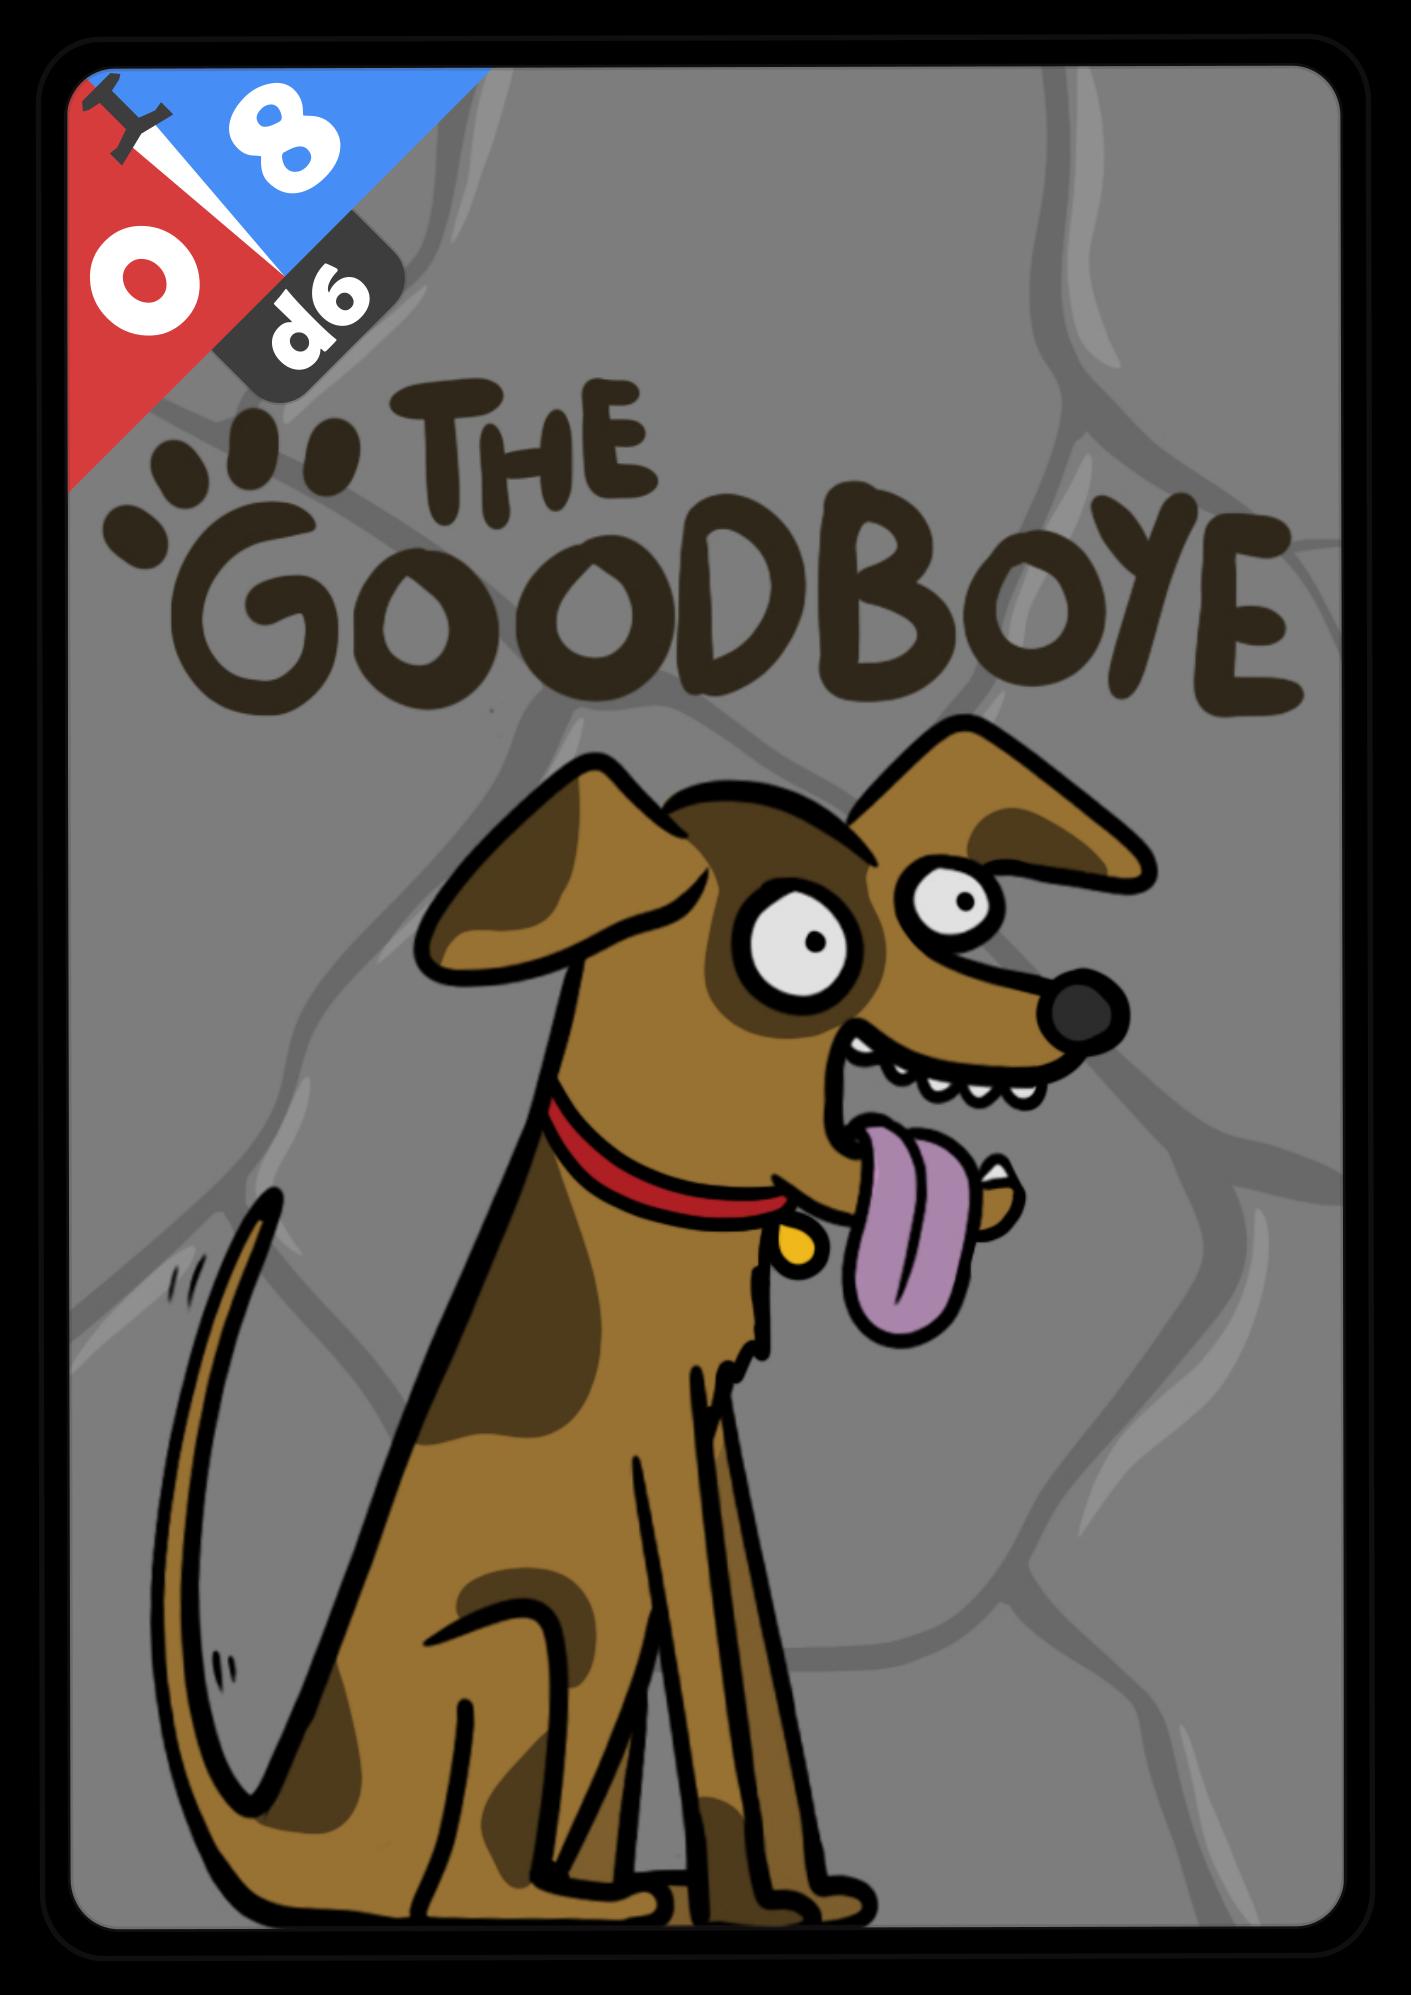 The Goodboye